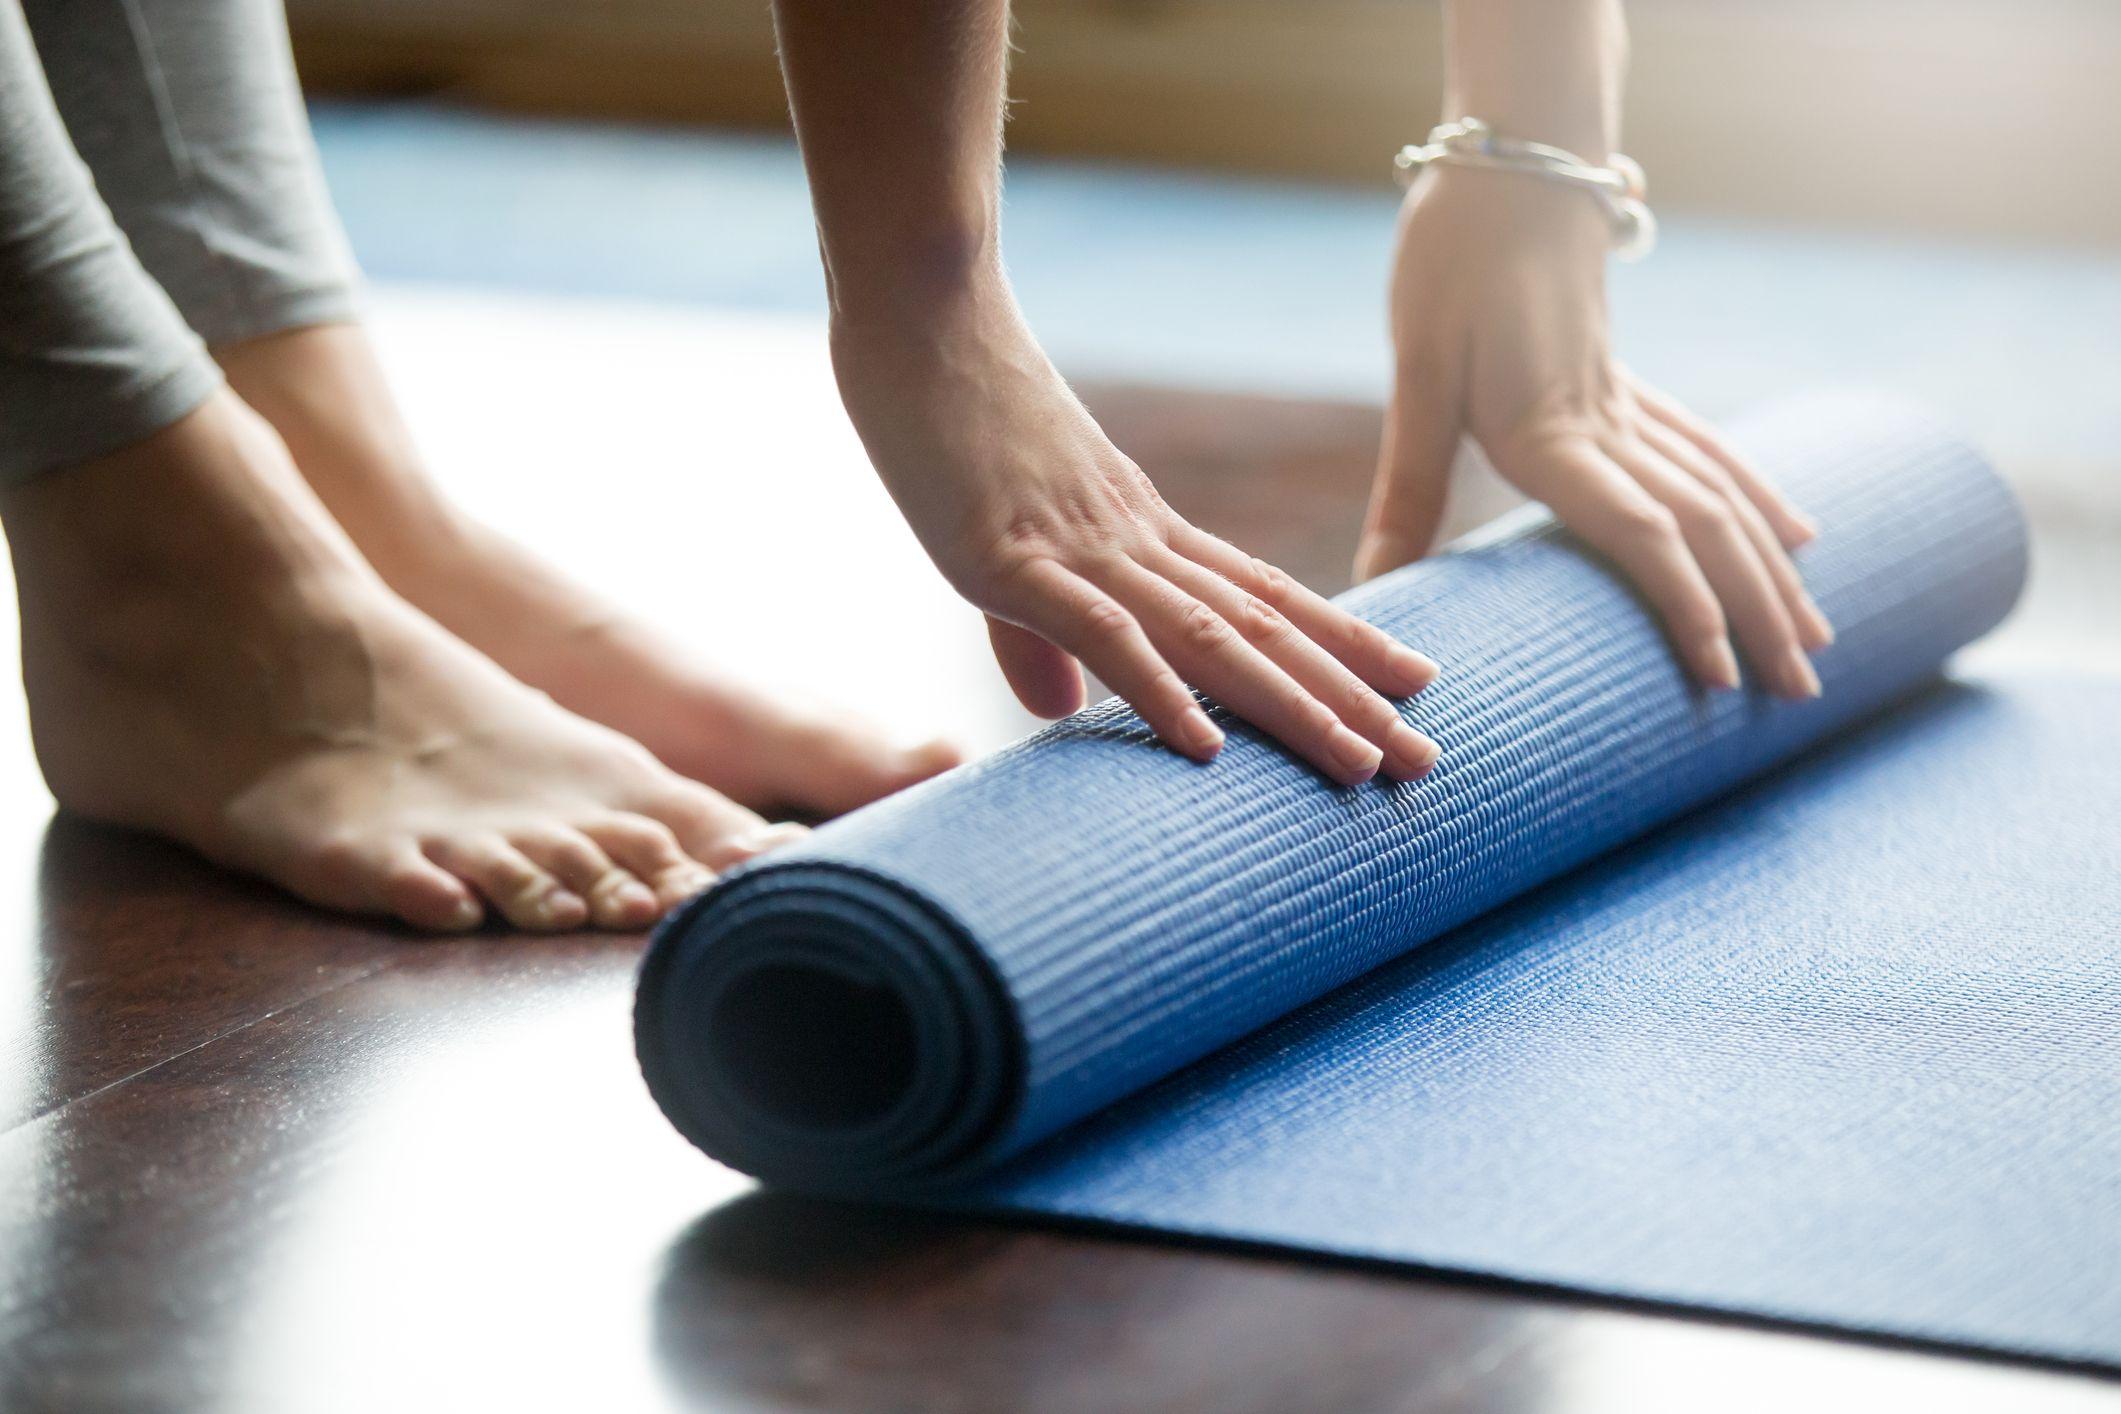 world mat slip bikram and natural rubber yoga evolve best liforme mats hot friendly s the eco non biodegradable heathyoga dp